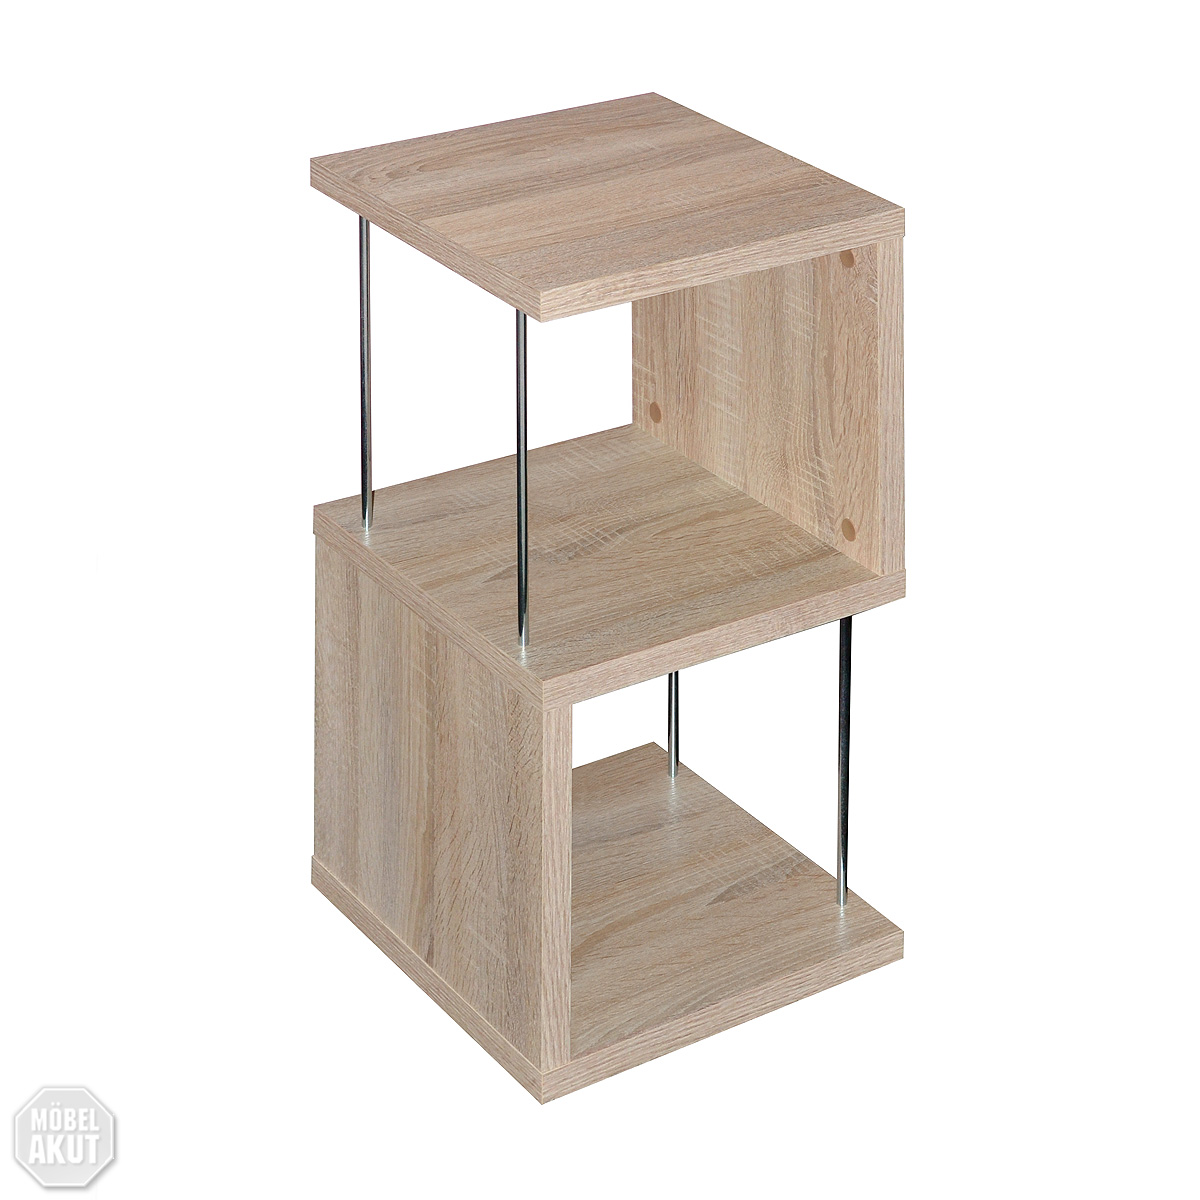 regal sticks standregal raumteiler sonoma eiche ebay. Black Bedroom Furniture Sets. Home Design Ideas